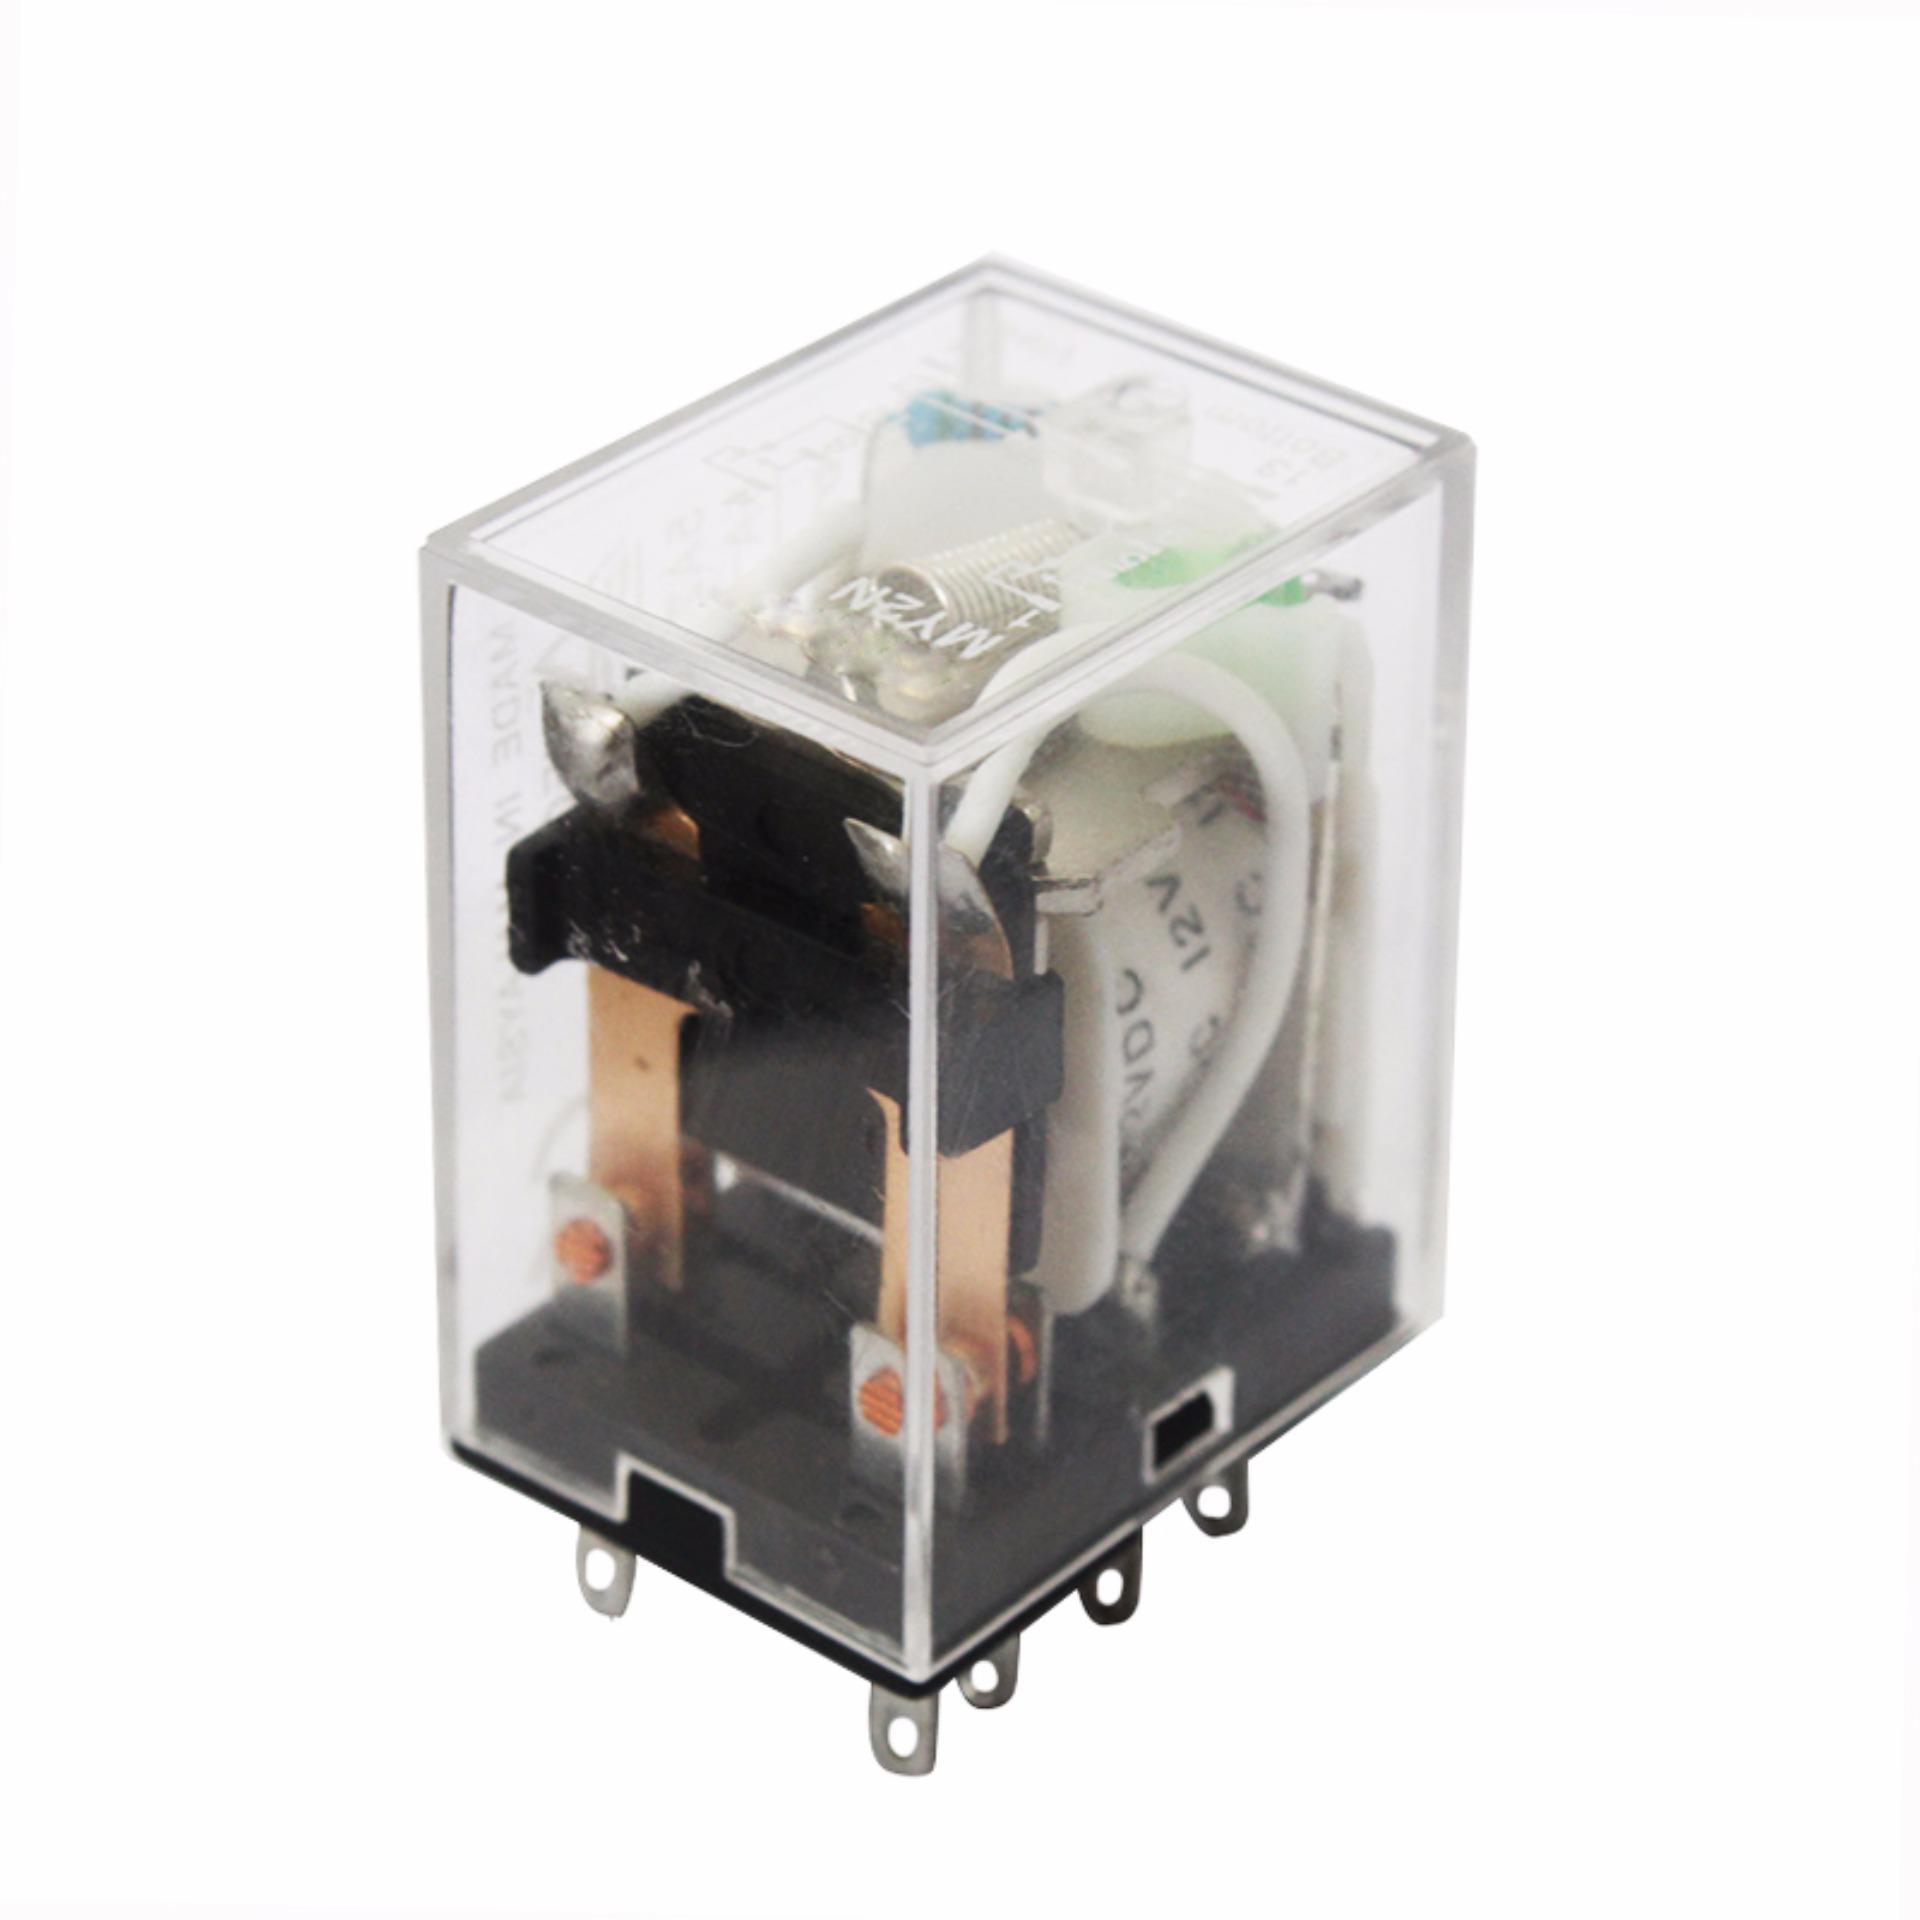 Eelic Stk 0937 Stop Kontak 5 Lubang Socket Untuk 2 Kaki Lampu Panjang Meter Merk Kyzuku 4 Steker Source